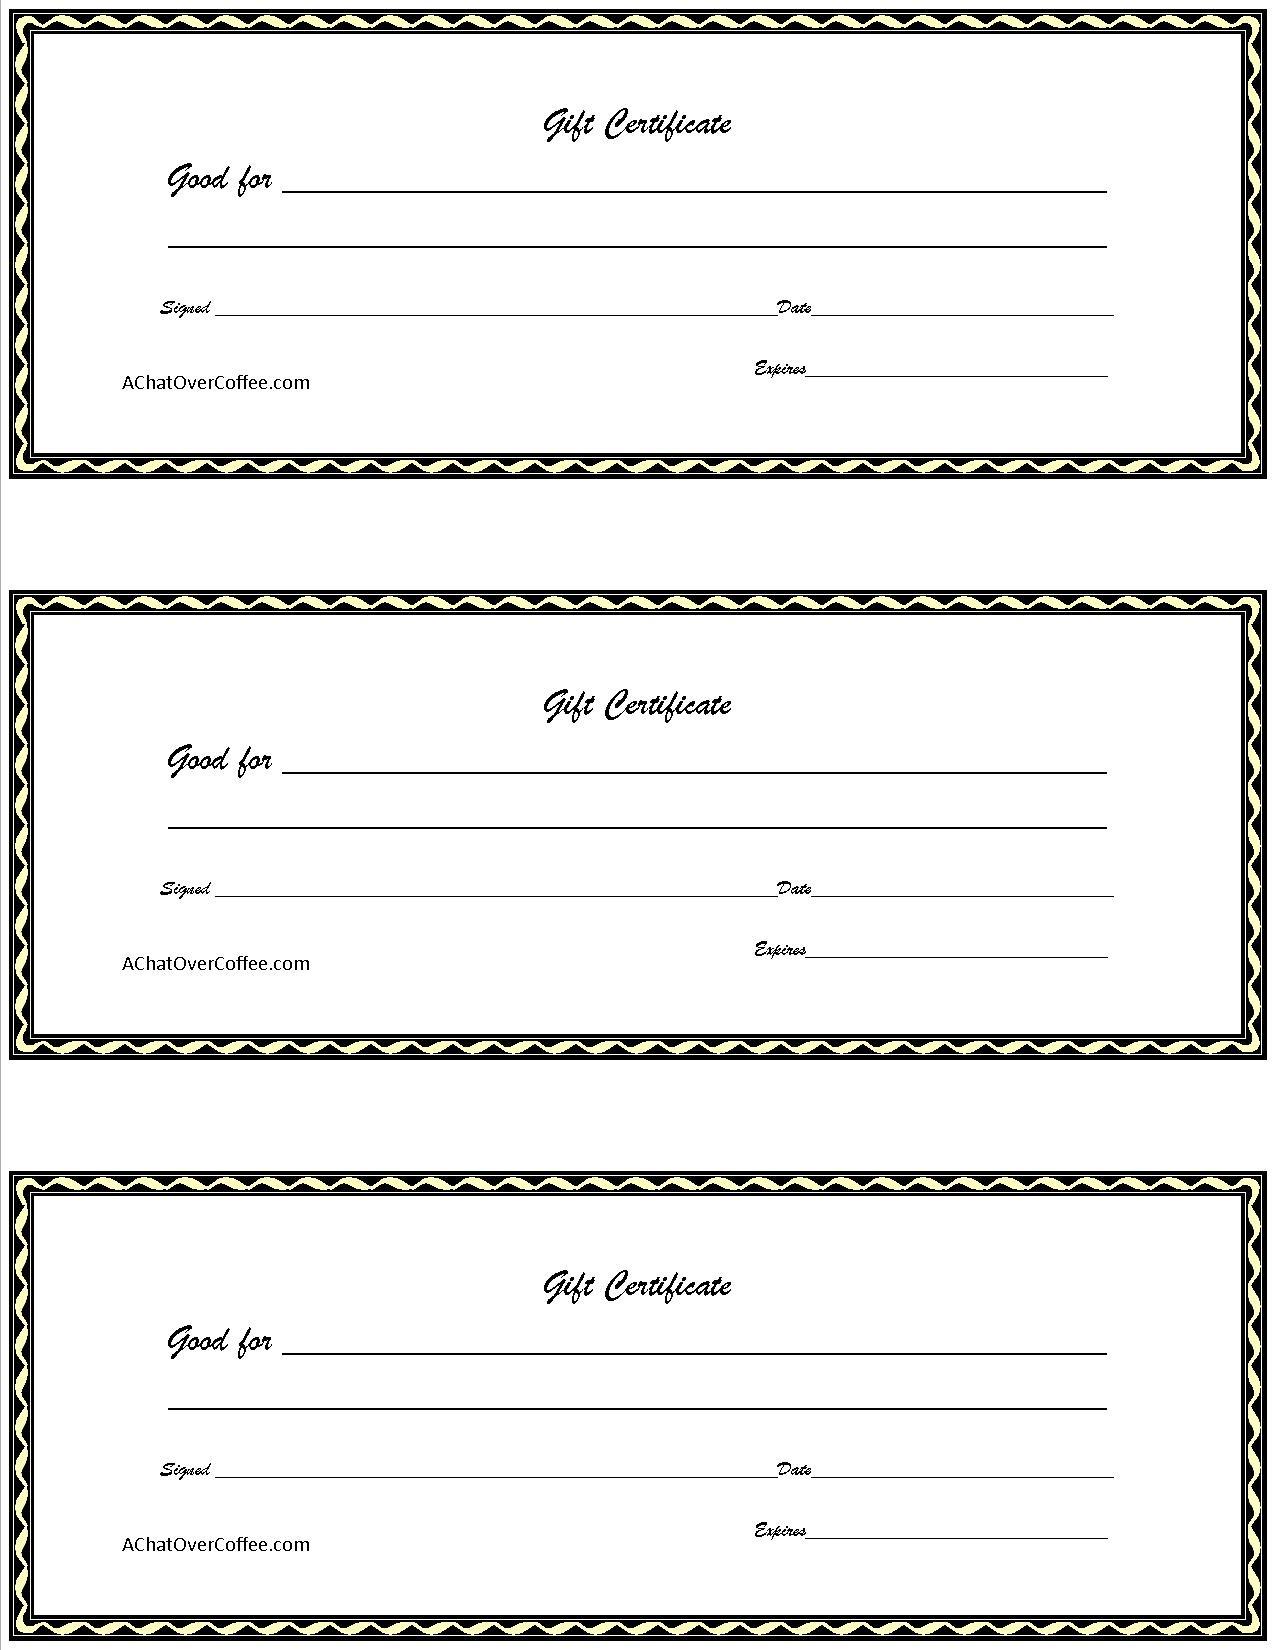 Nouberoakland/g/017-Free-Printable-Gift-Certif - Free Printable Gift Cards